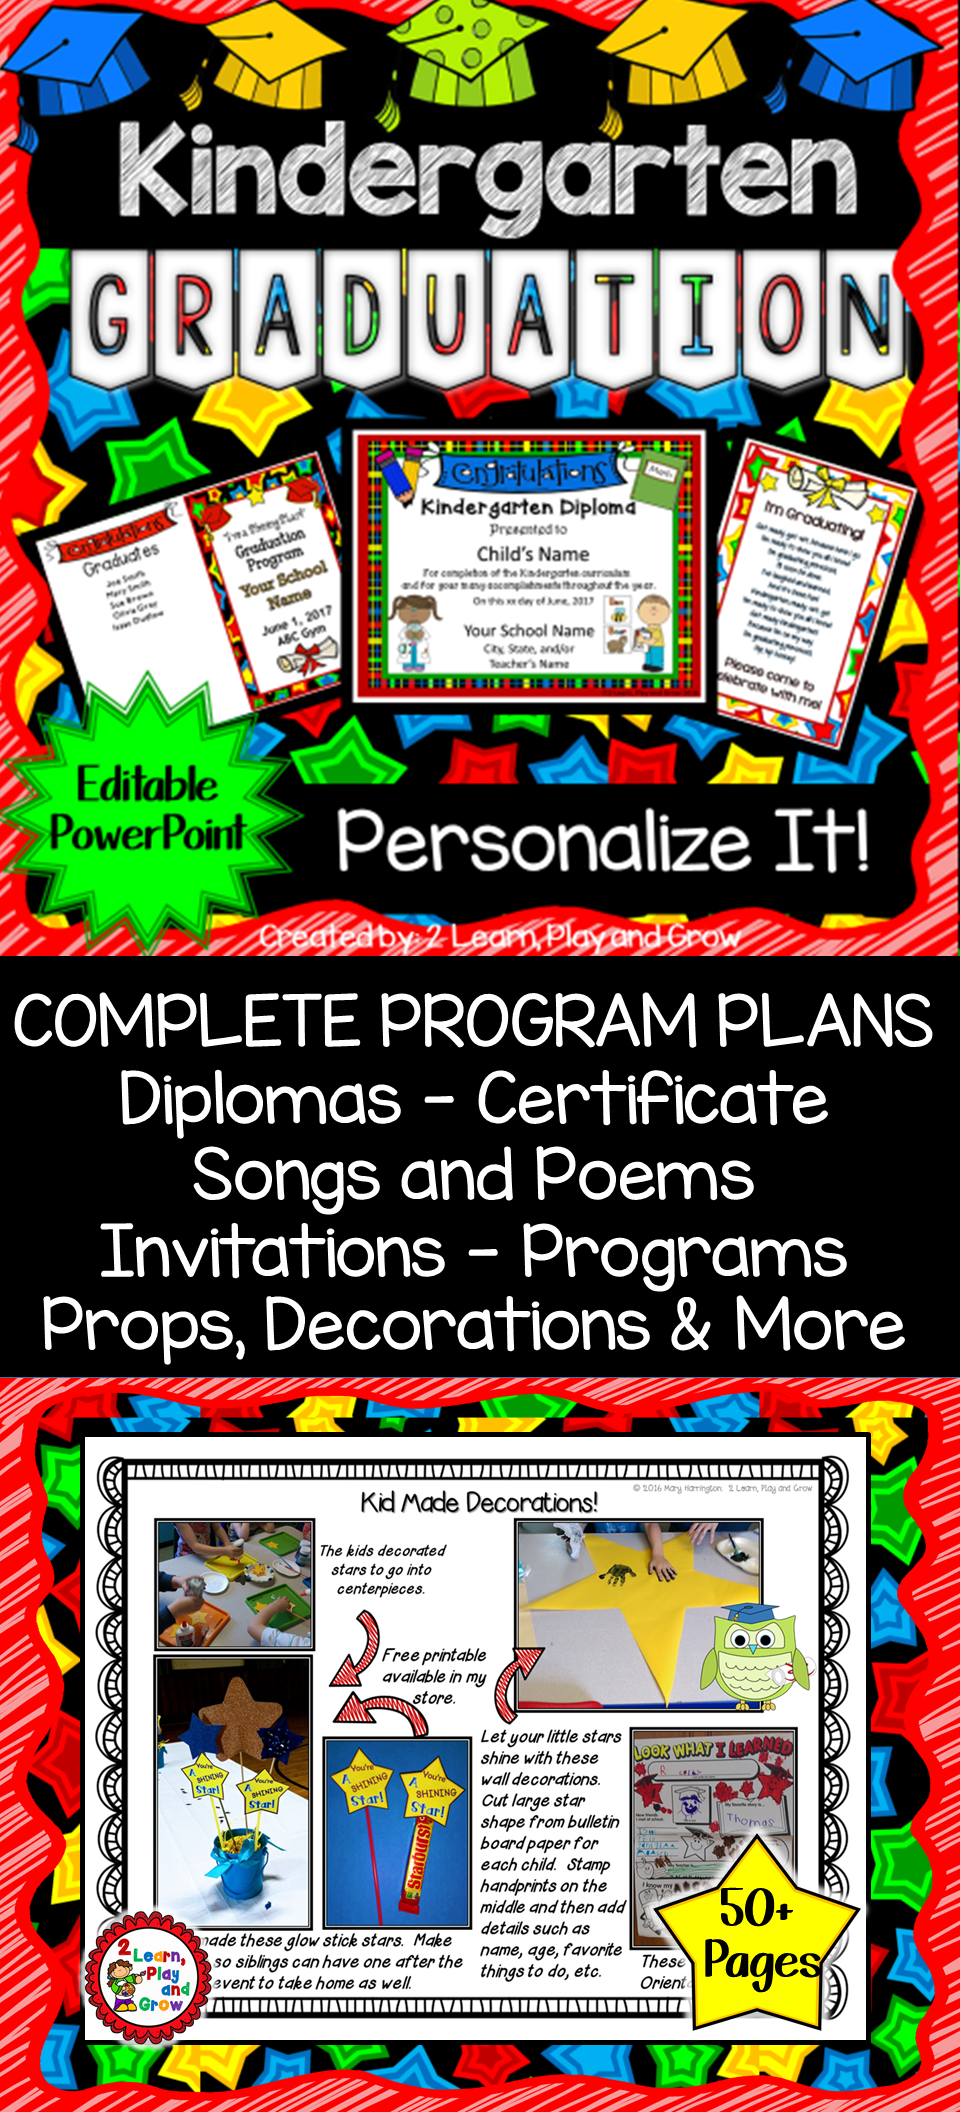 Kindergarten graduation diplomas programs invitations songs kindergarten graduation diplomas programs invitations songs more editable filmwisefo